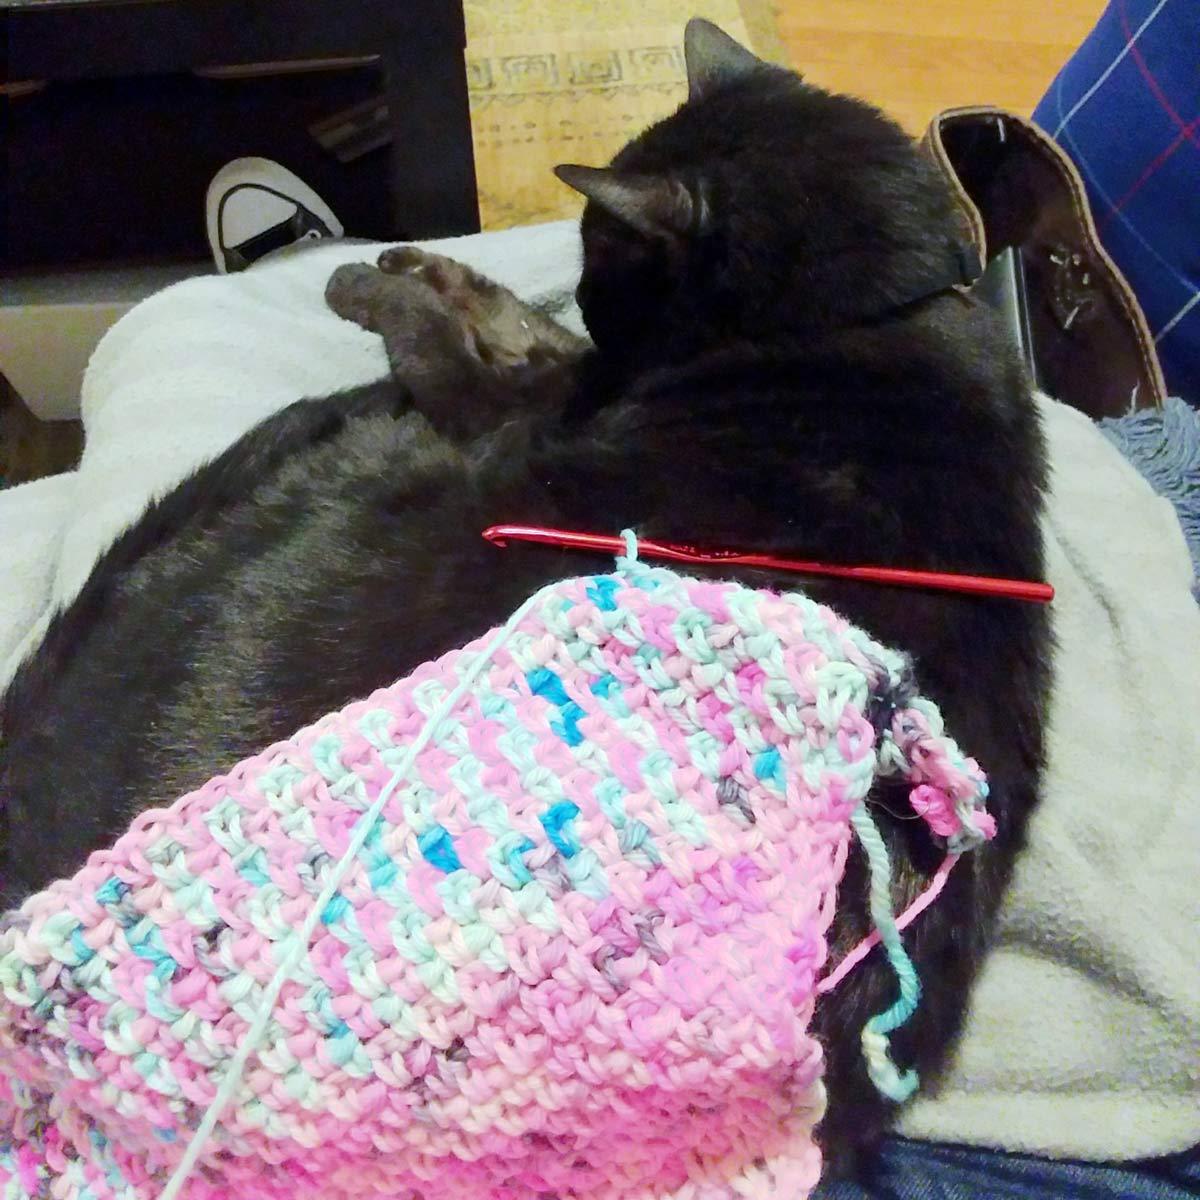 Black cat sitting on person's lap on a grey fleece blanket. On the cat's back is a crochet project in progress.